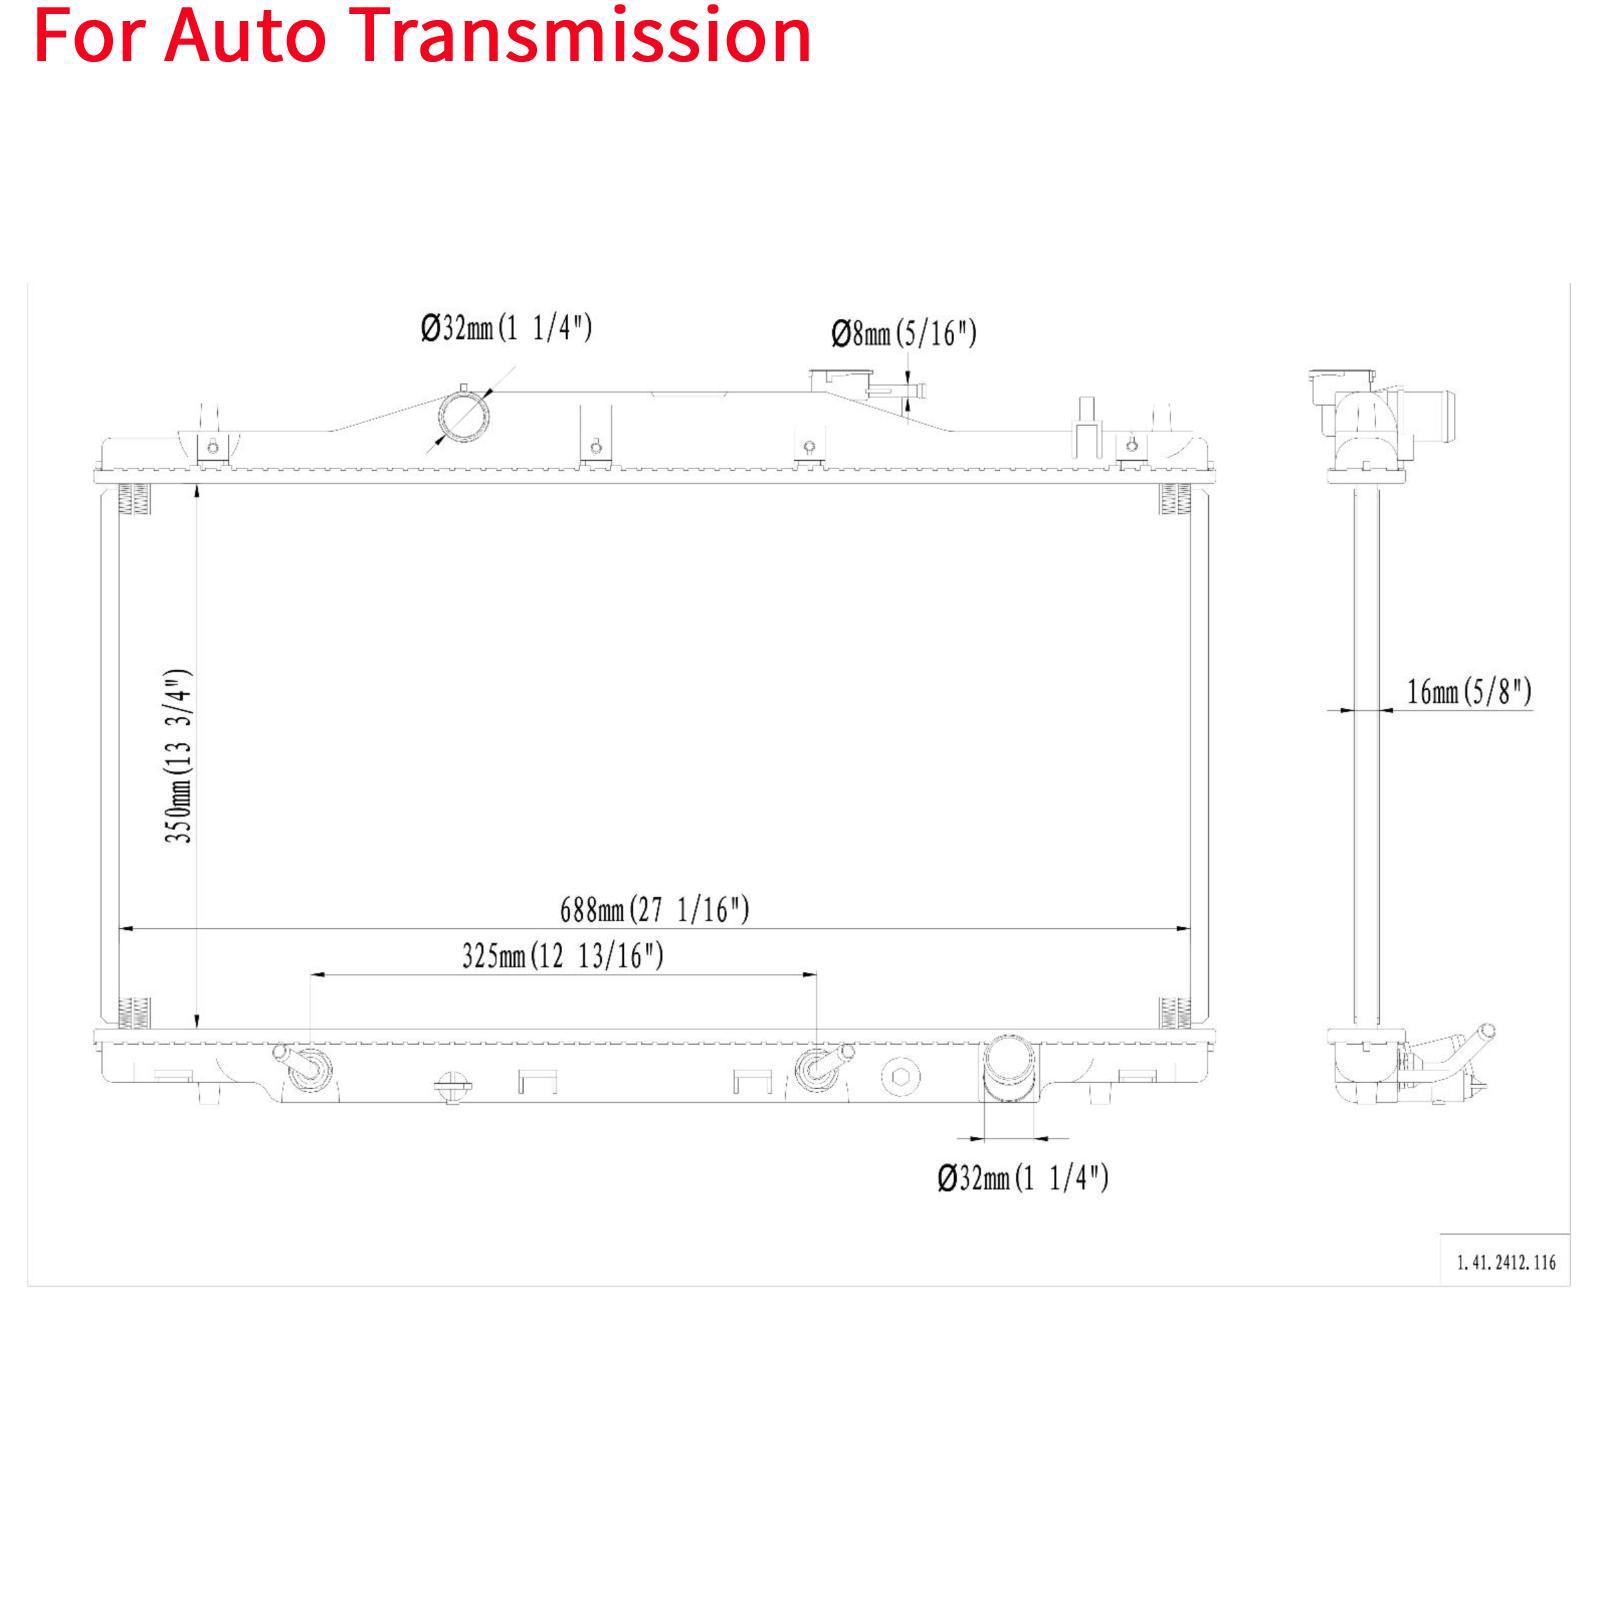 Automatic AT Aluminum/Plastic Radiator 1 Row For 2002-2006